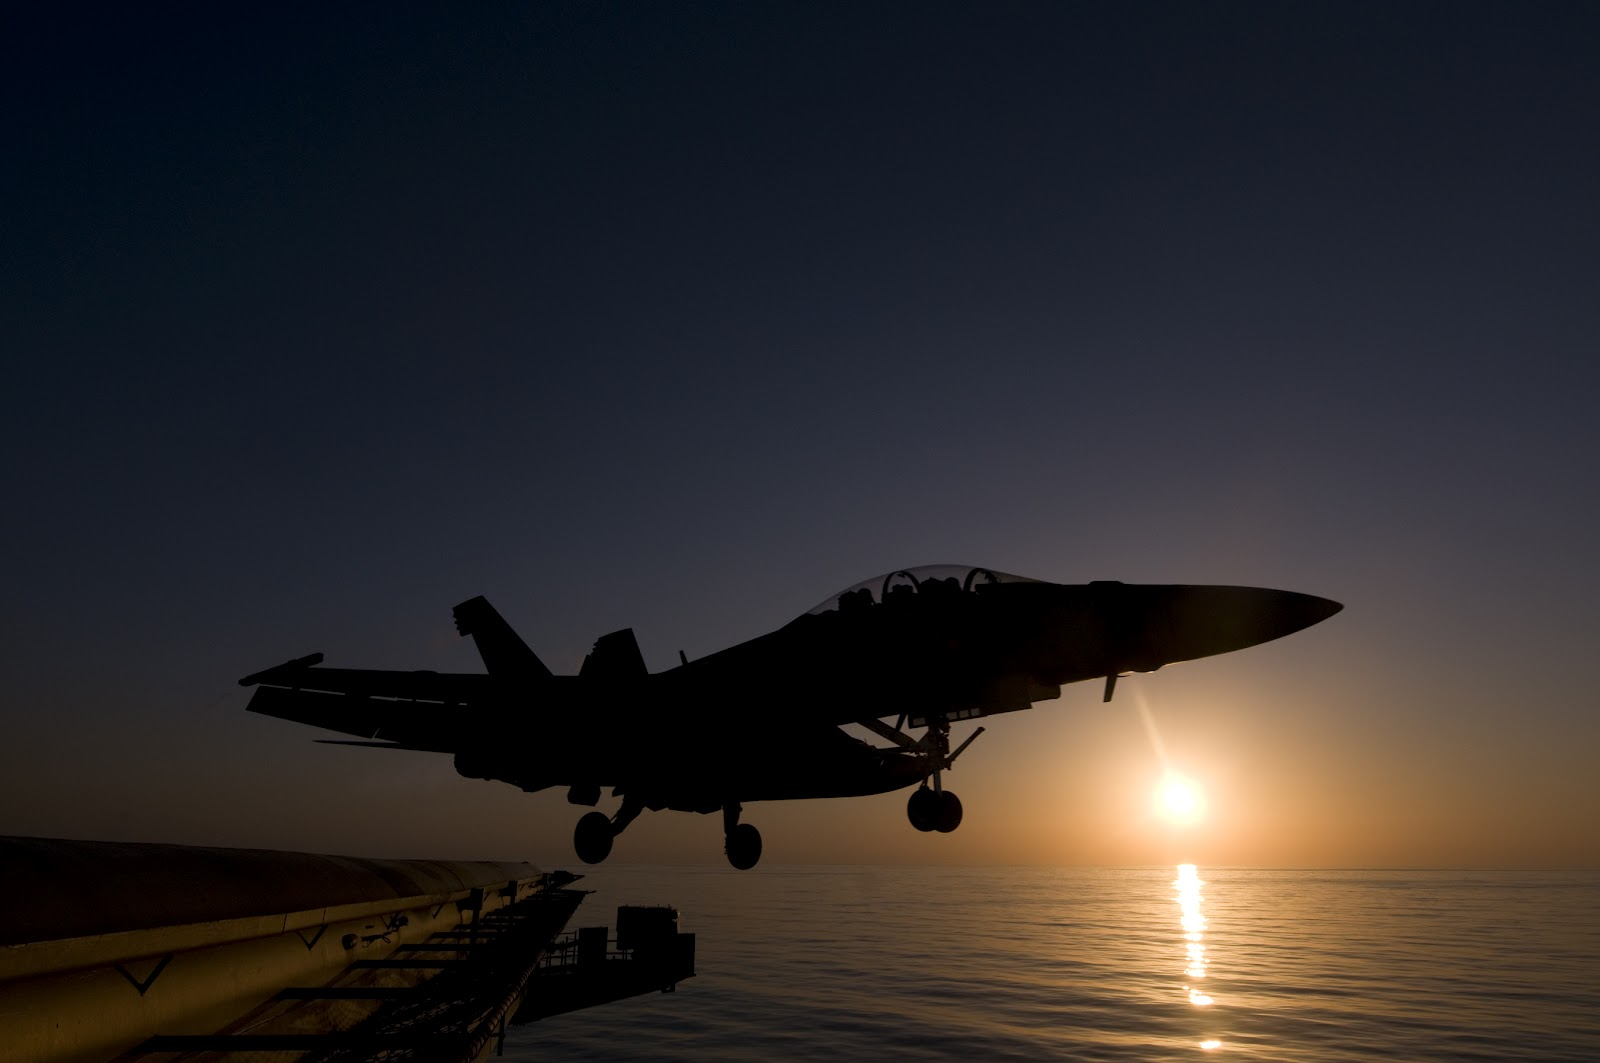 http://1.bp.blogspot.com/-rMnVtXqW-kw/Ty-5Yk6ynHI/AAAAAAAAJ3o/K5ACN3BjFYU/s1600/navy-f18-jet-free-photo-120126-N-TZ605-406.jpg